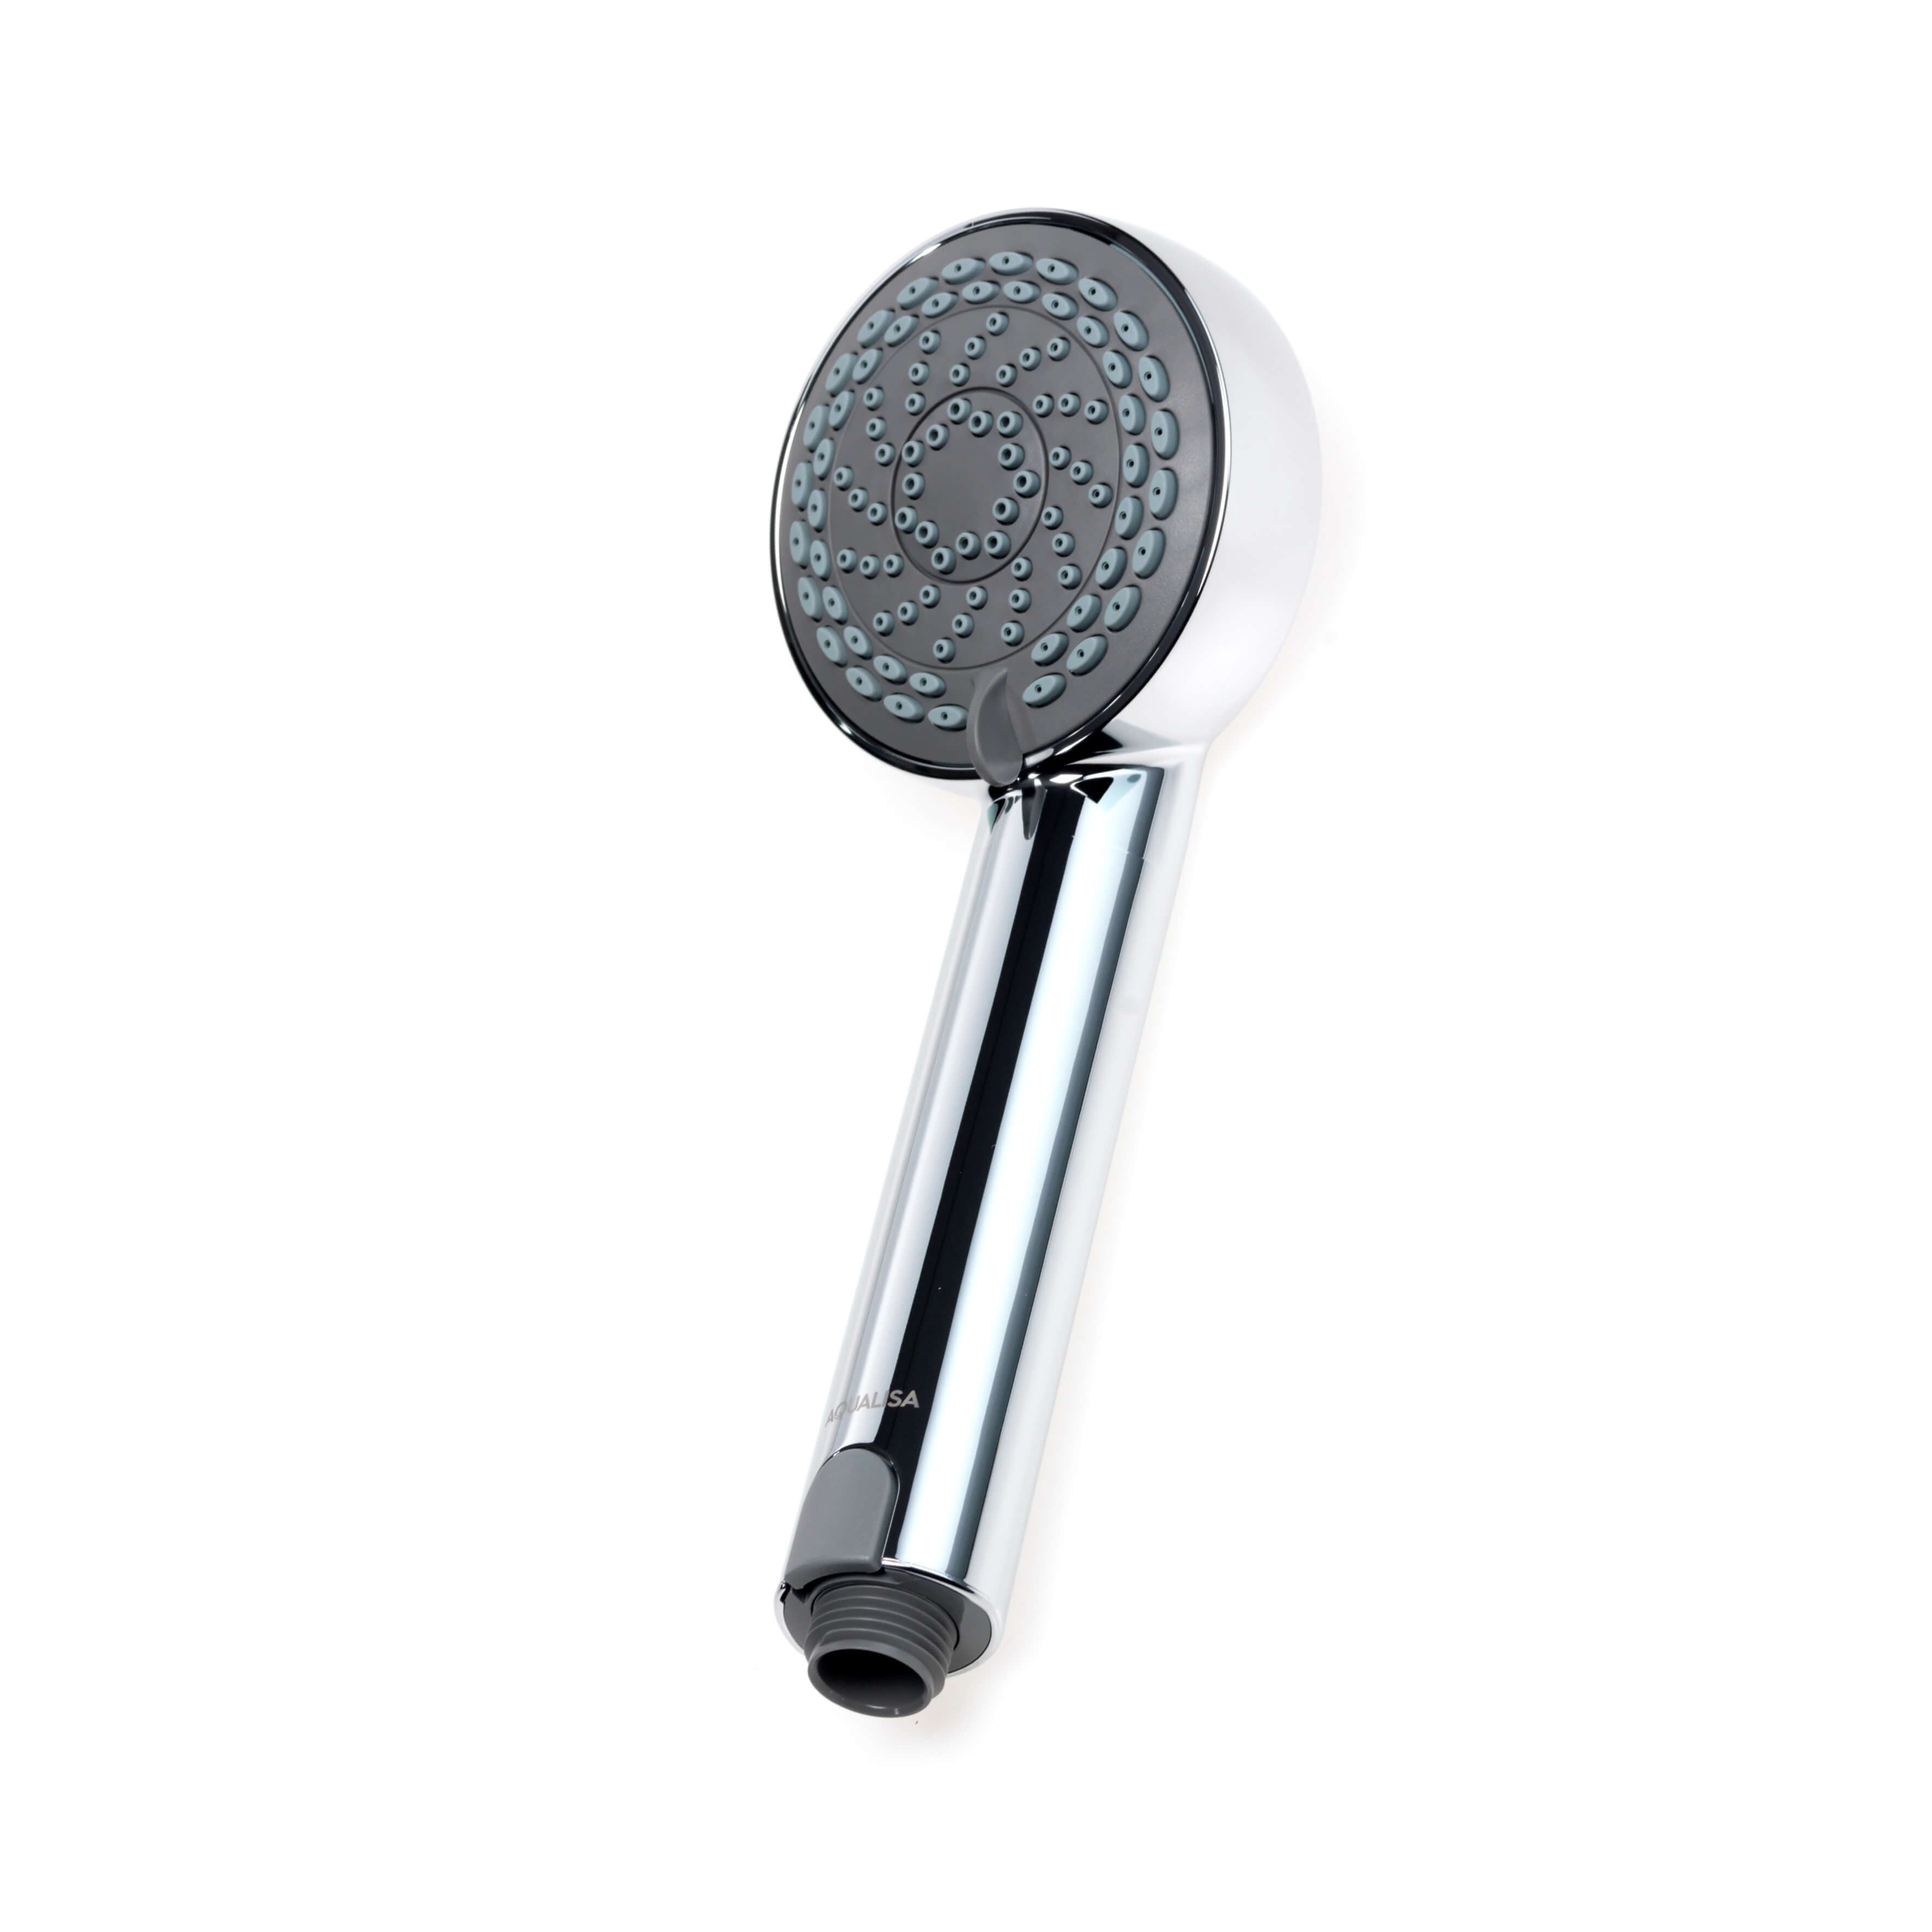 Aqualisa Harmony 90mm Head Chrome 901501